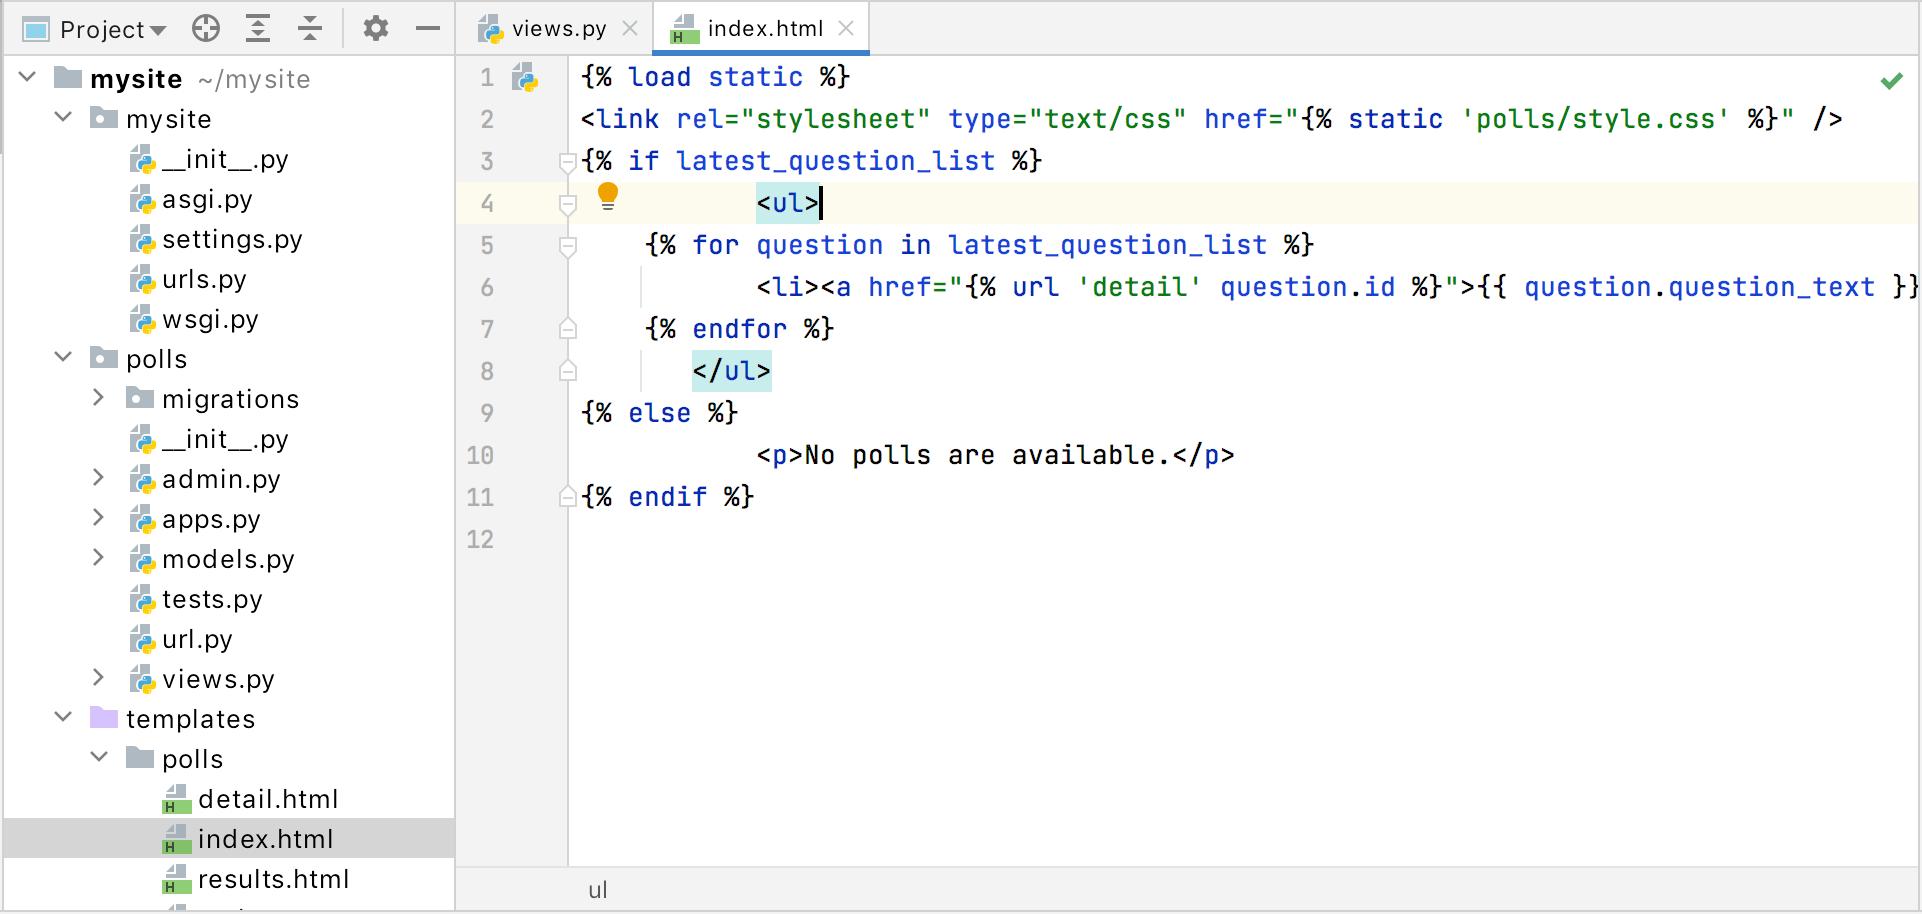 Opened index.html